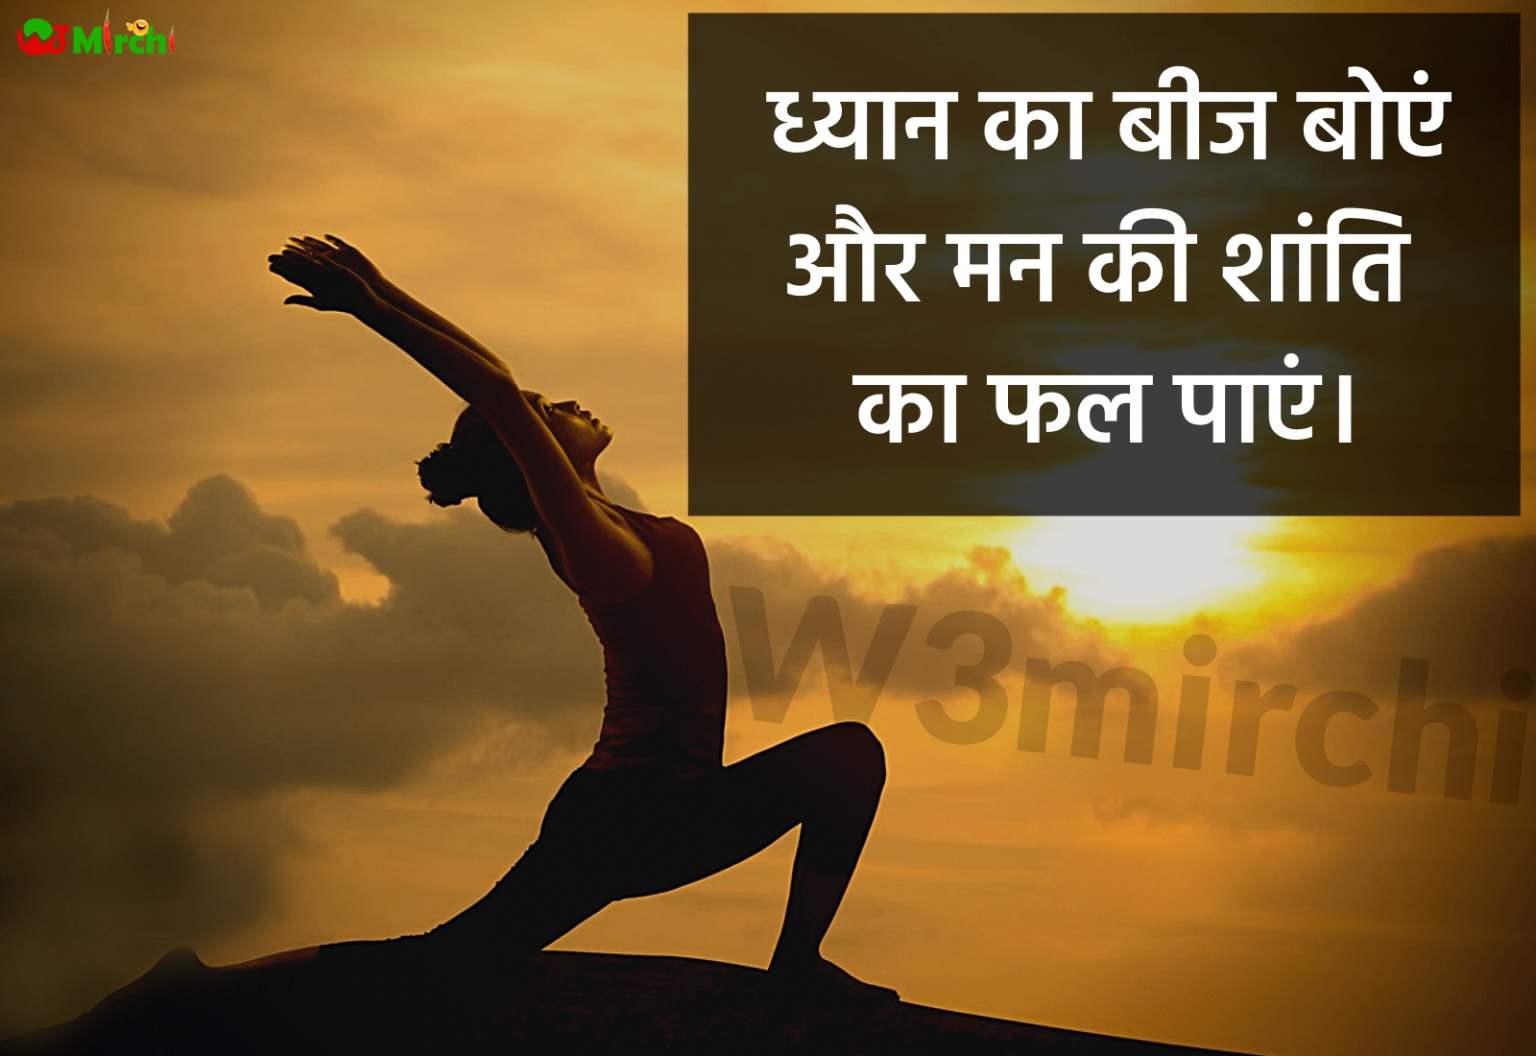 Yoga Quotes (योगा कोट्स)